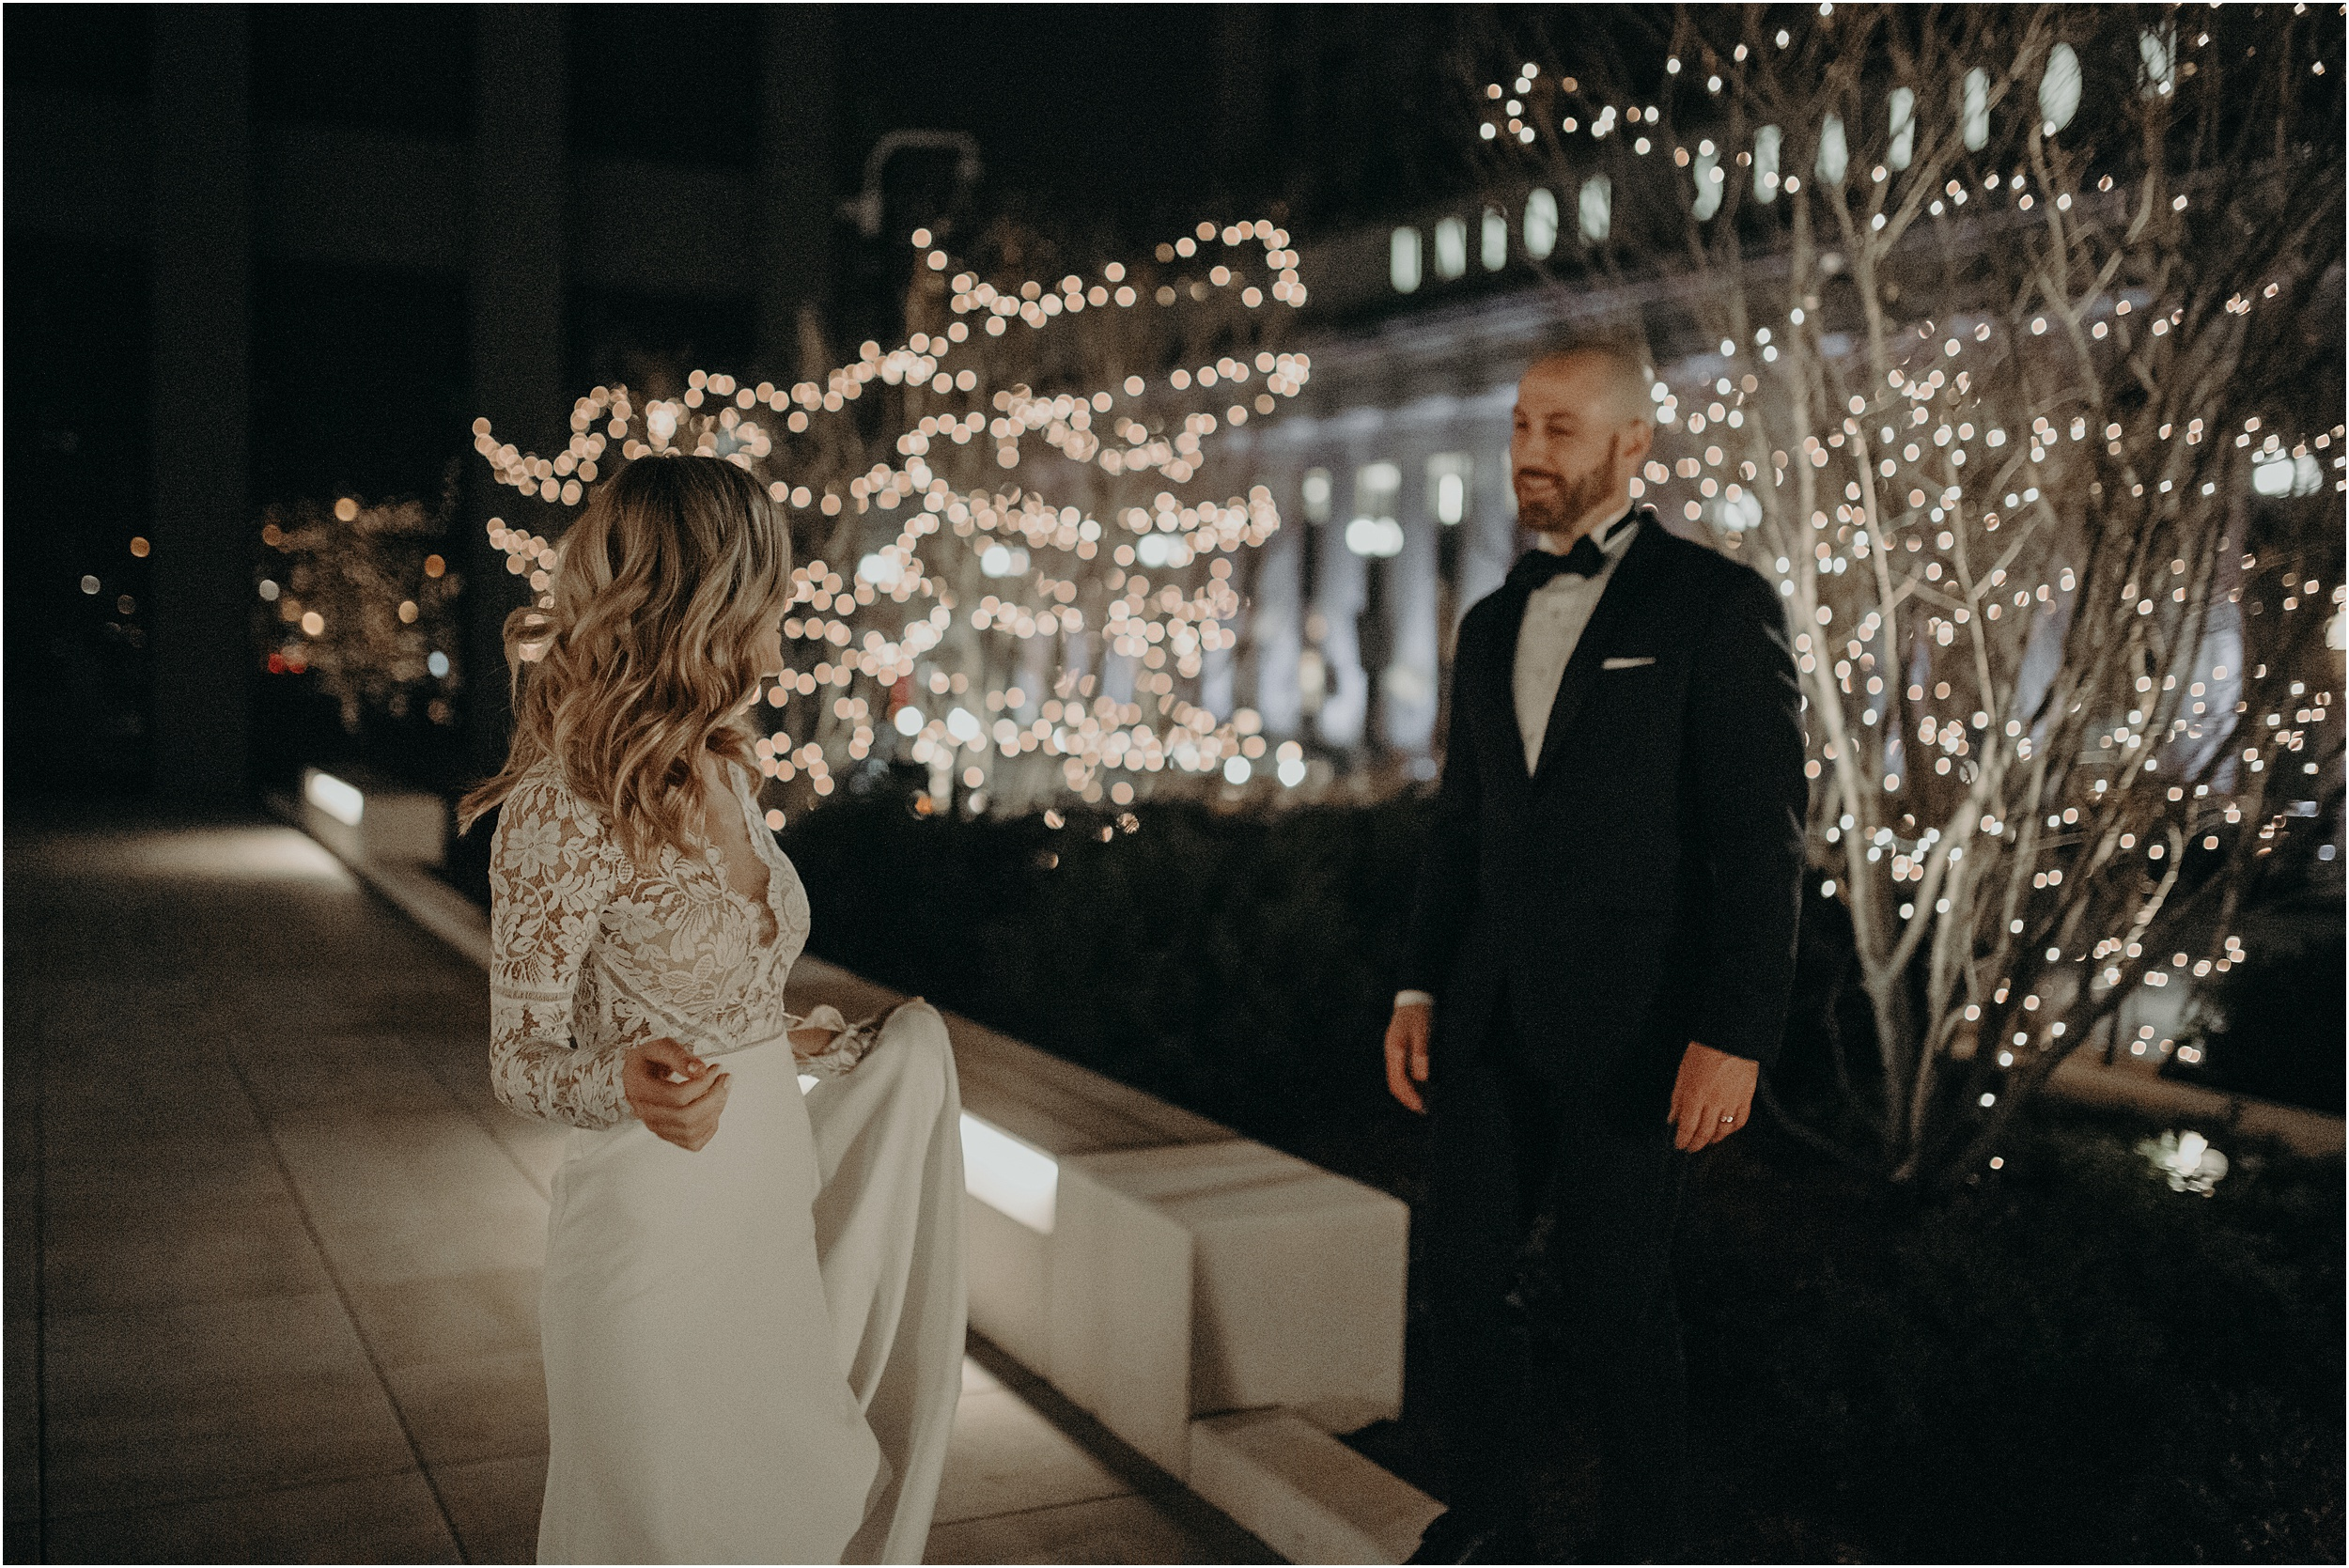 chicago_wedding_photographer_wright_photographs_0125.jpg